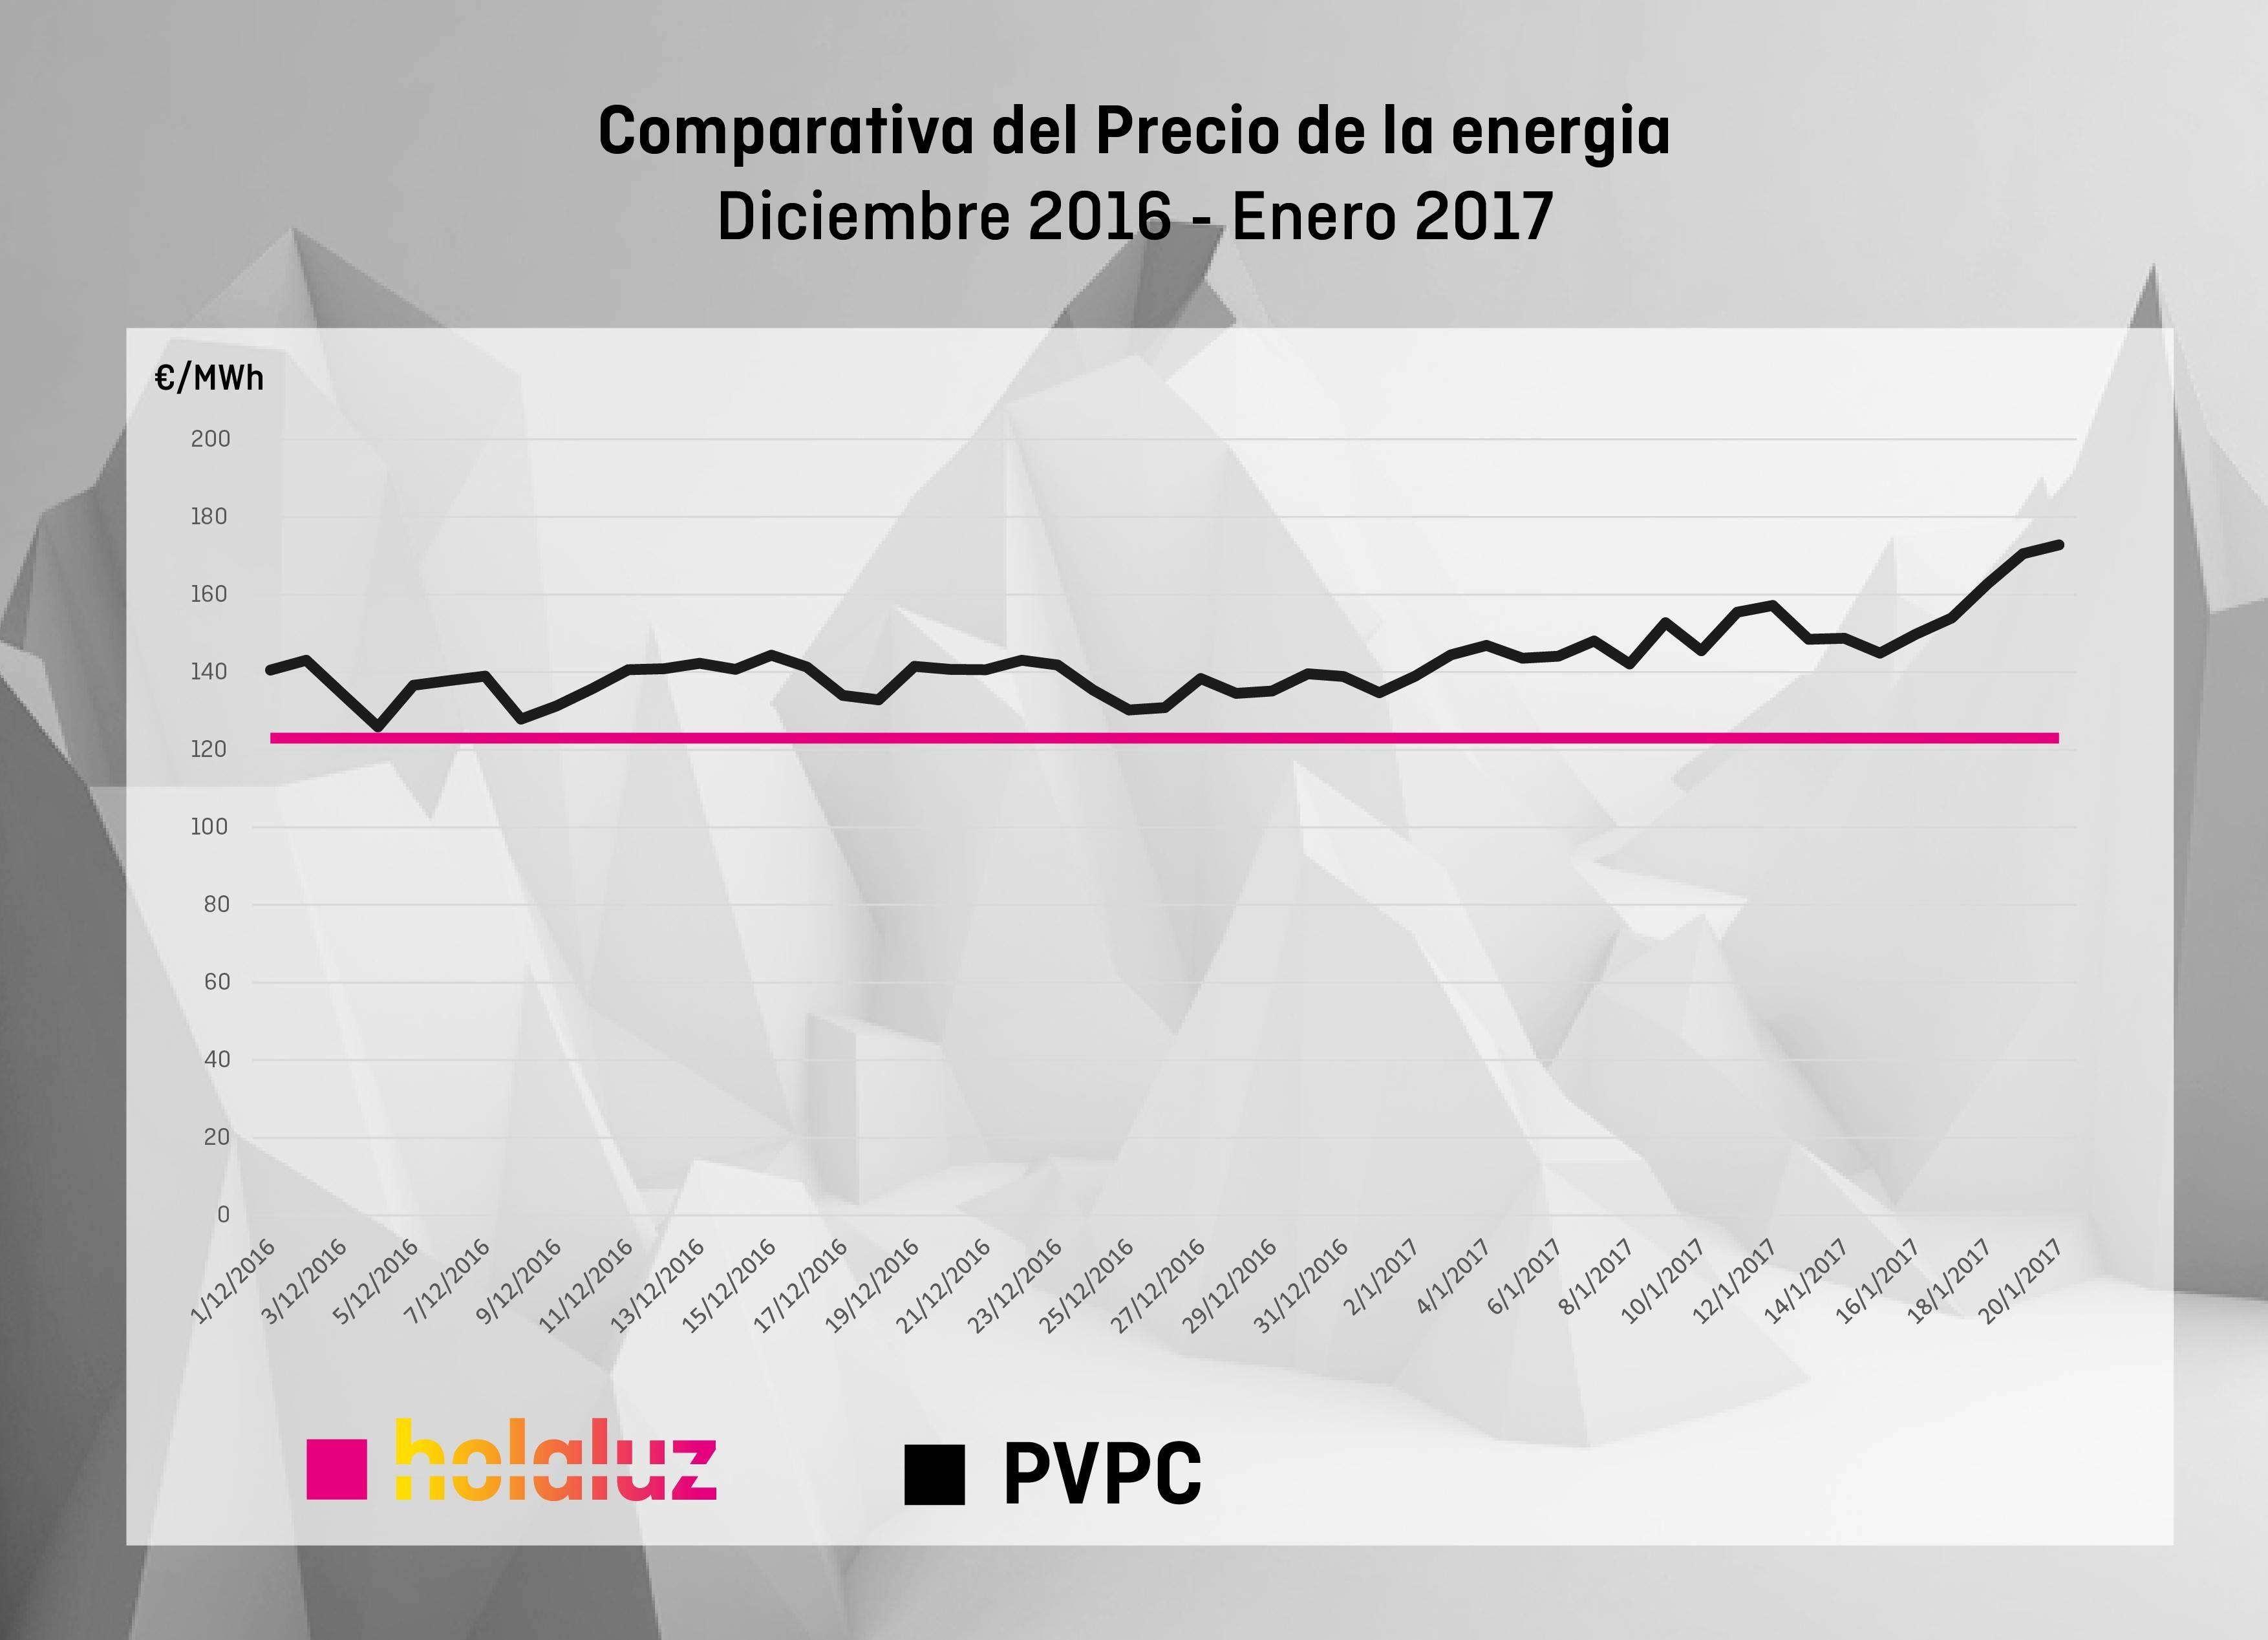 PVPC vs Holaluz